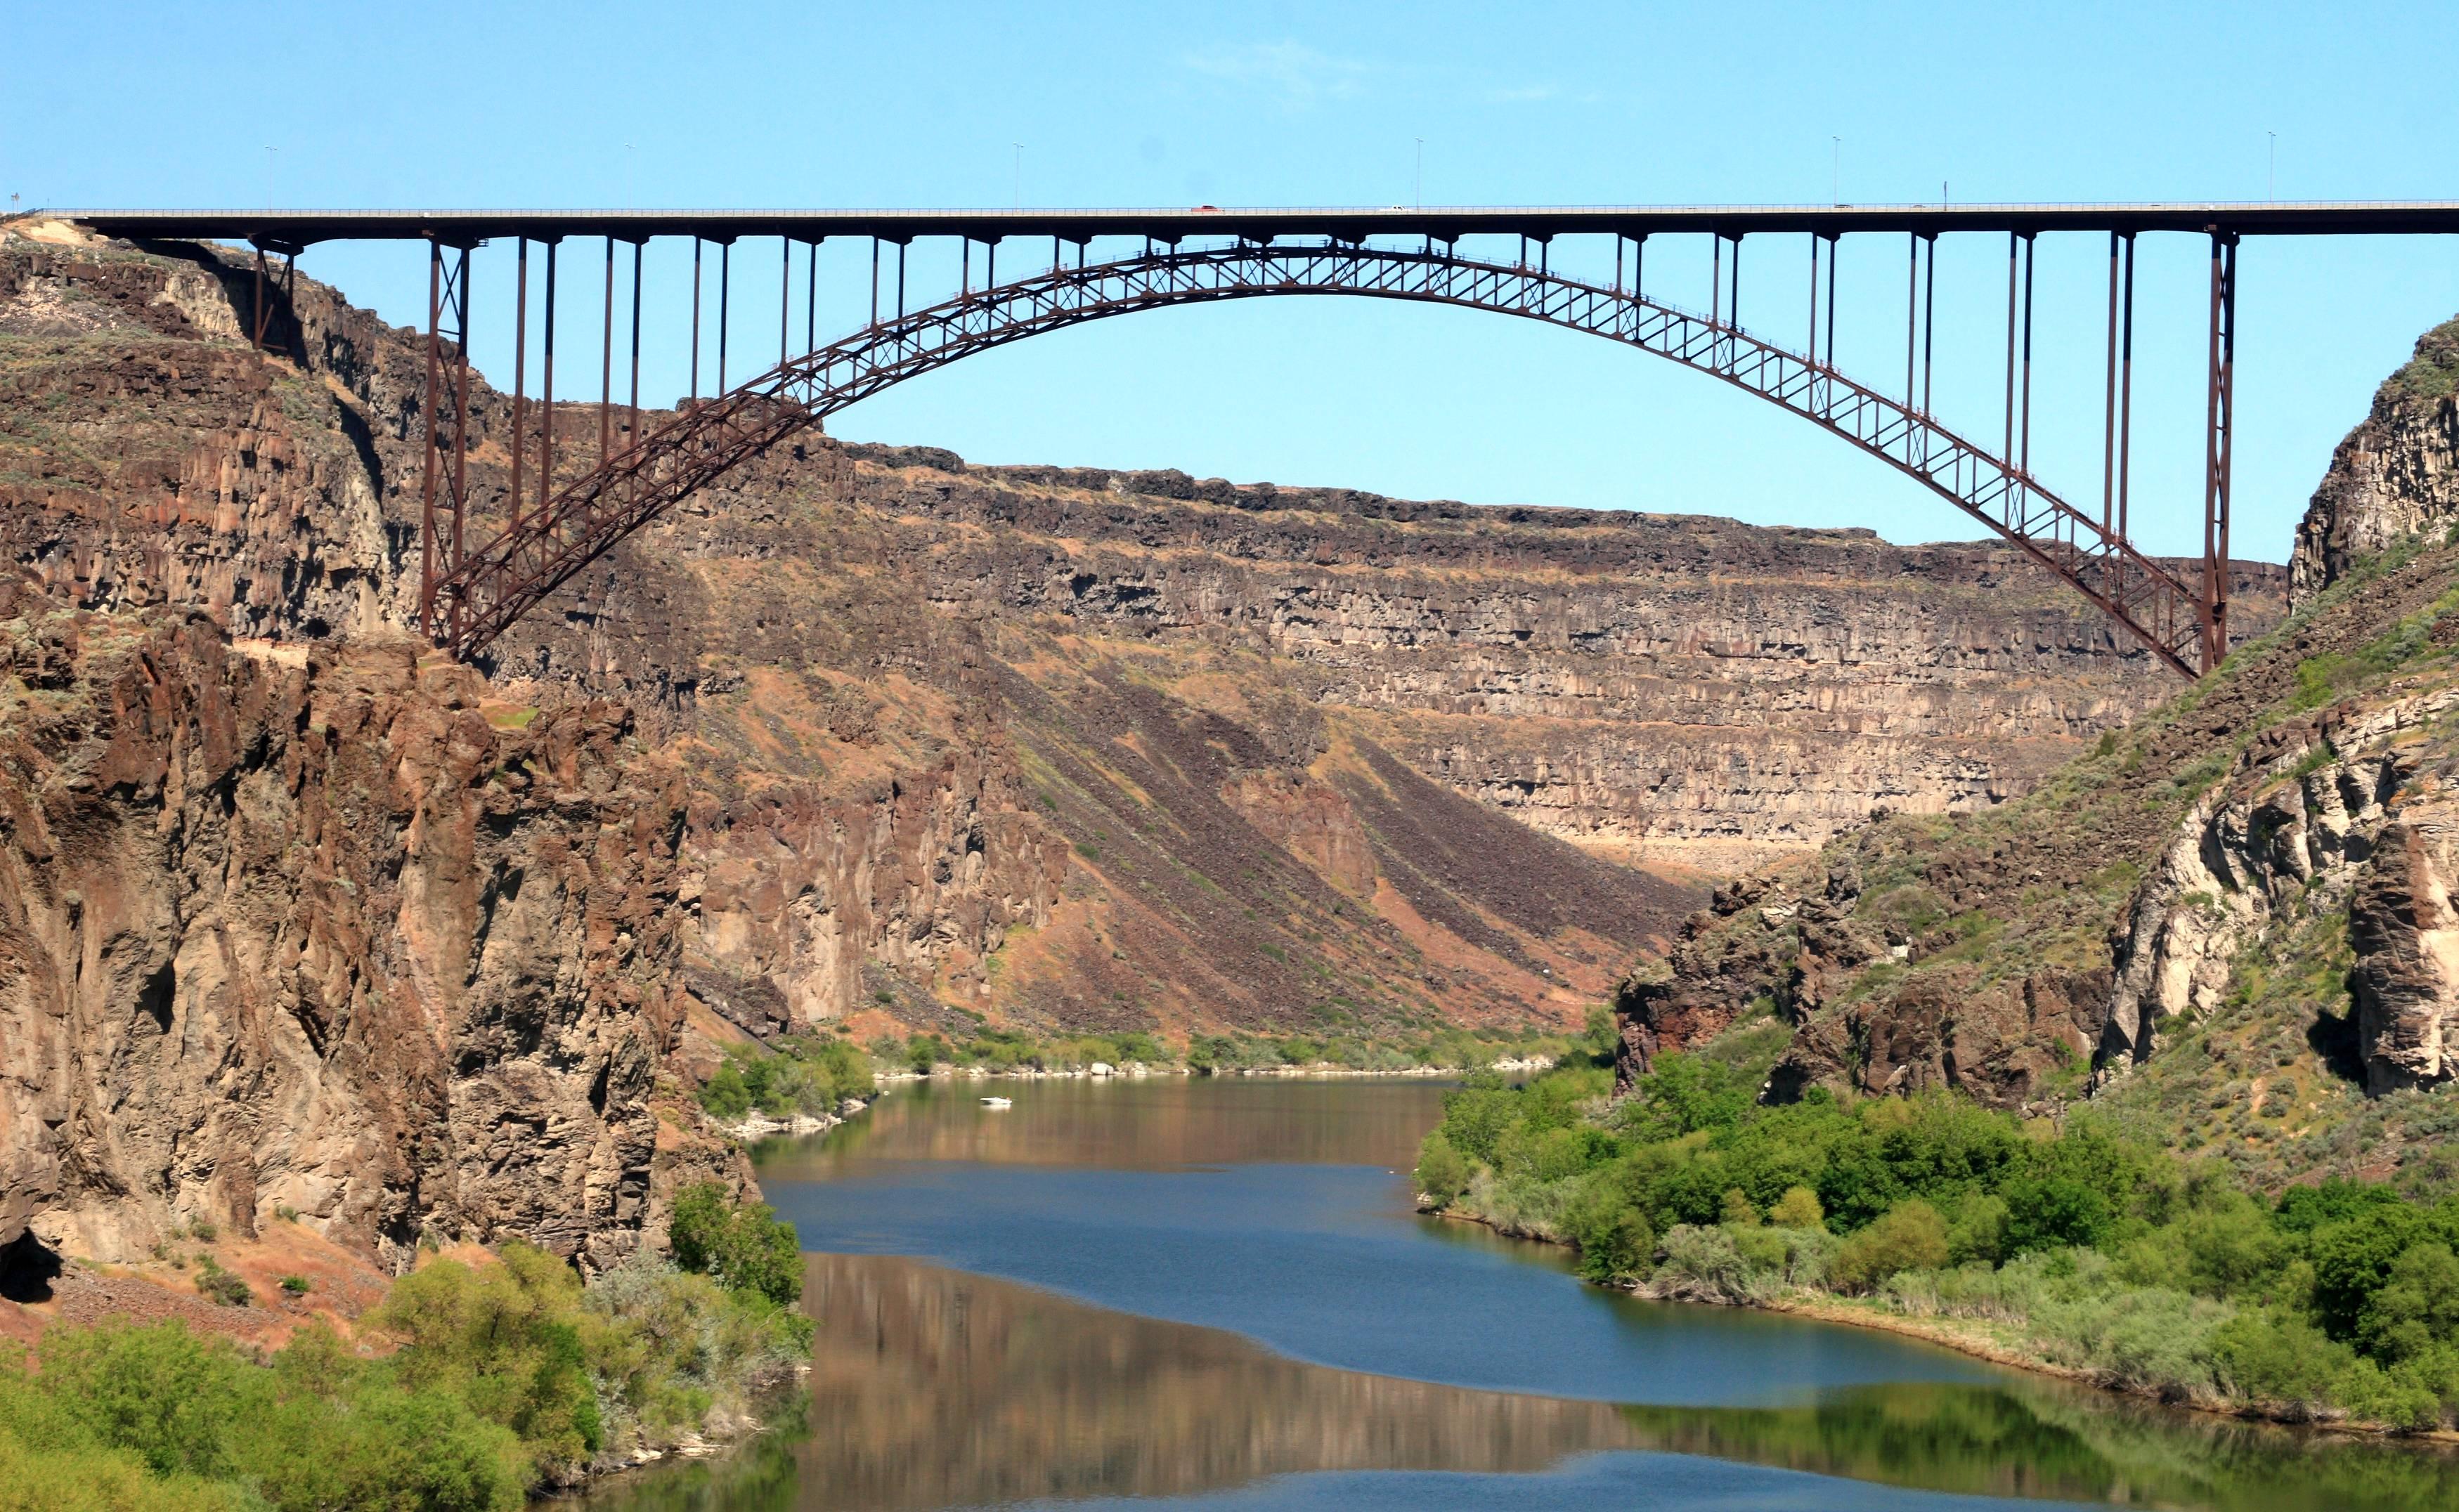 Dateiperrine Bridge Spanning The Snake River At Twin Falls Idaho